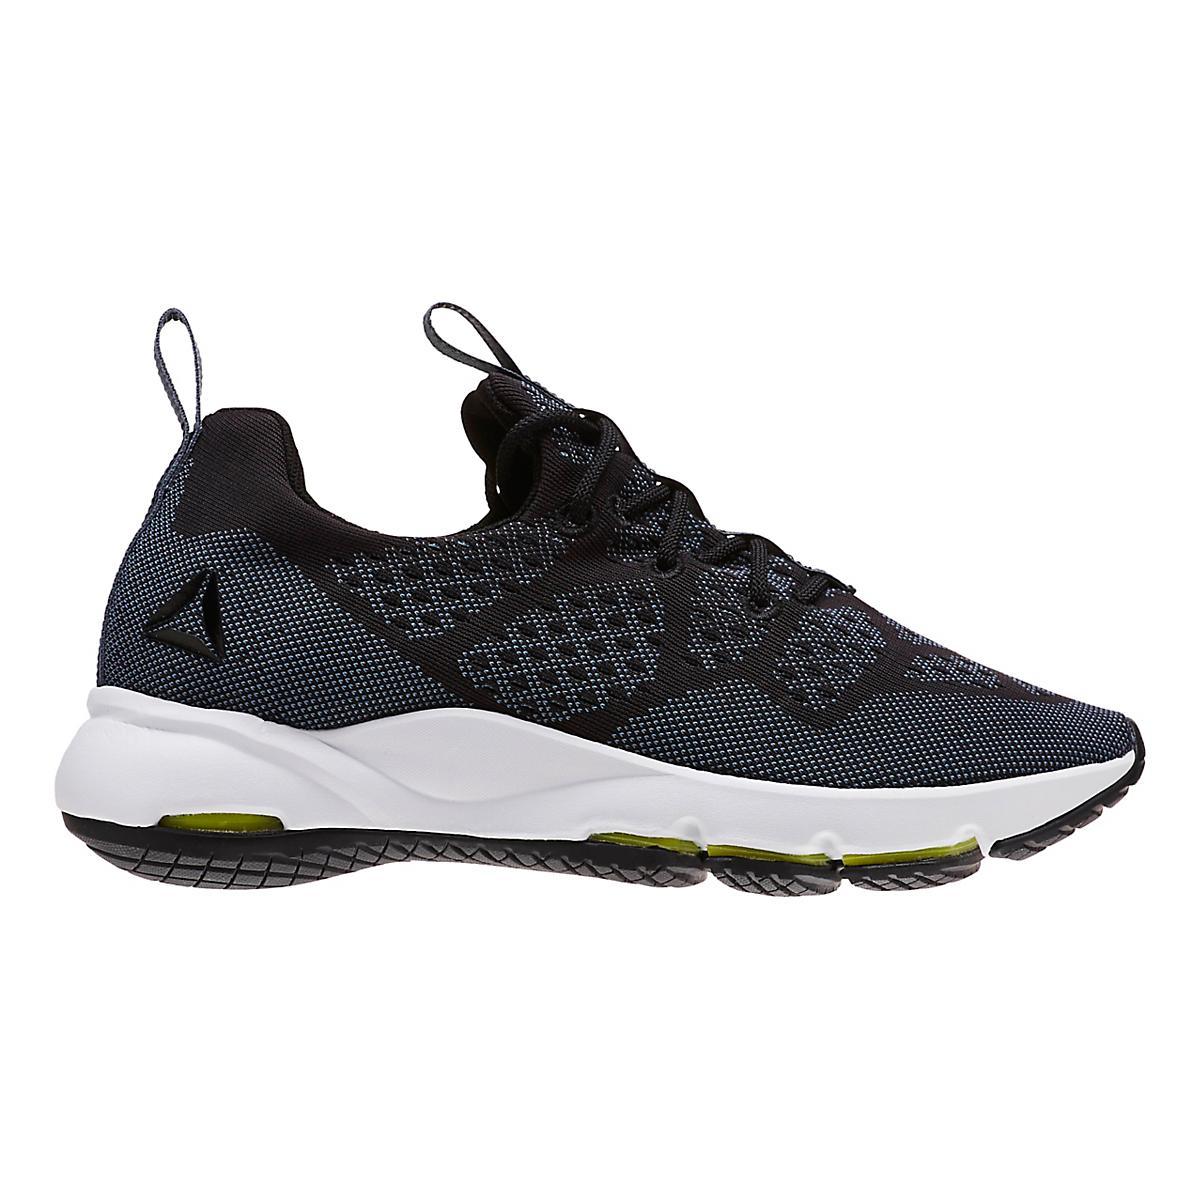 f5f38a01128 Womens Reebok Cloudride LS DMX Walking Shoe at Road Runner Sports